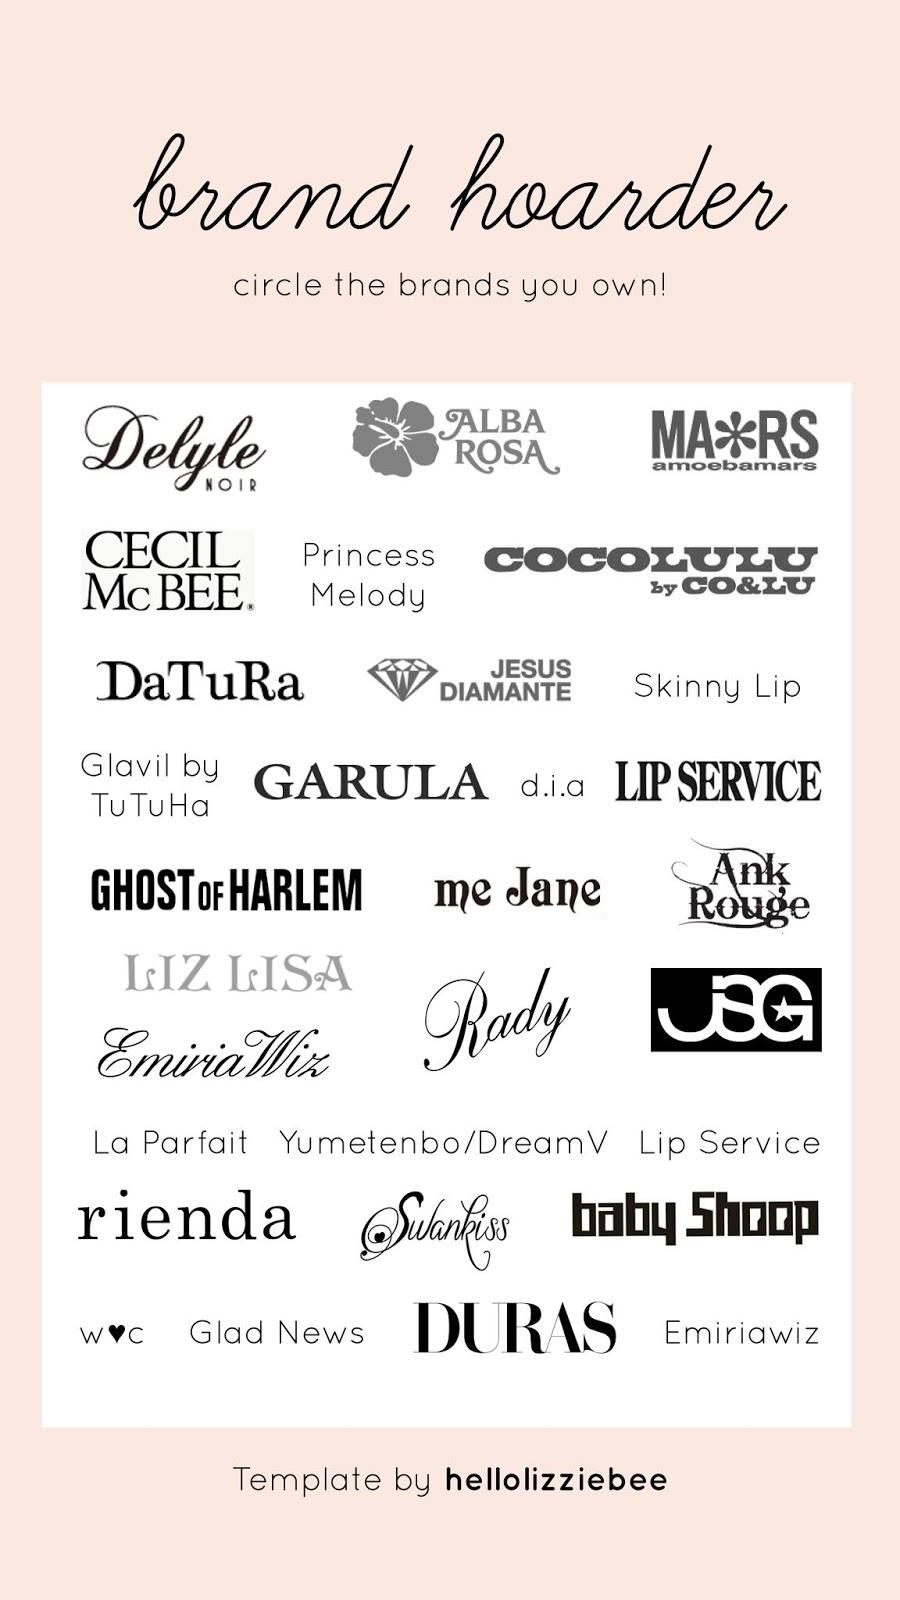 gyaru instagram stories template - brands